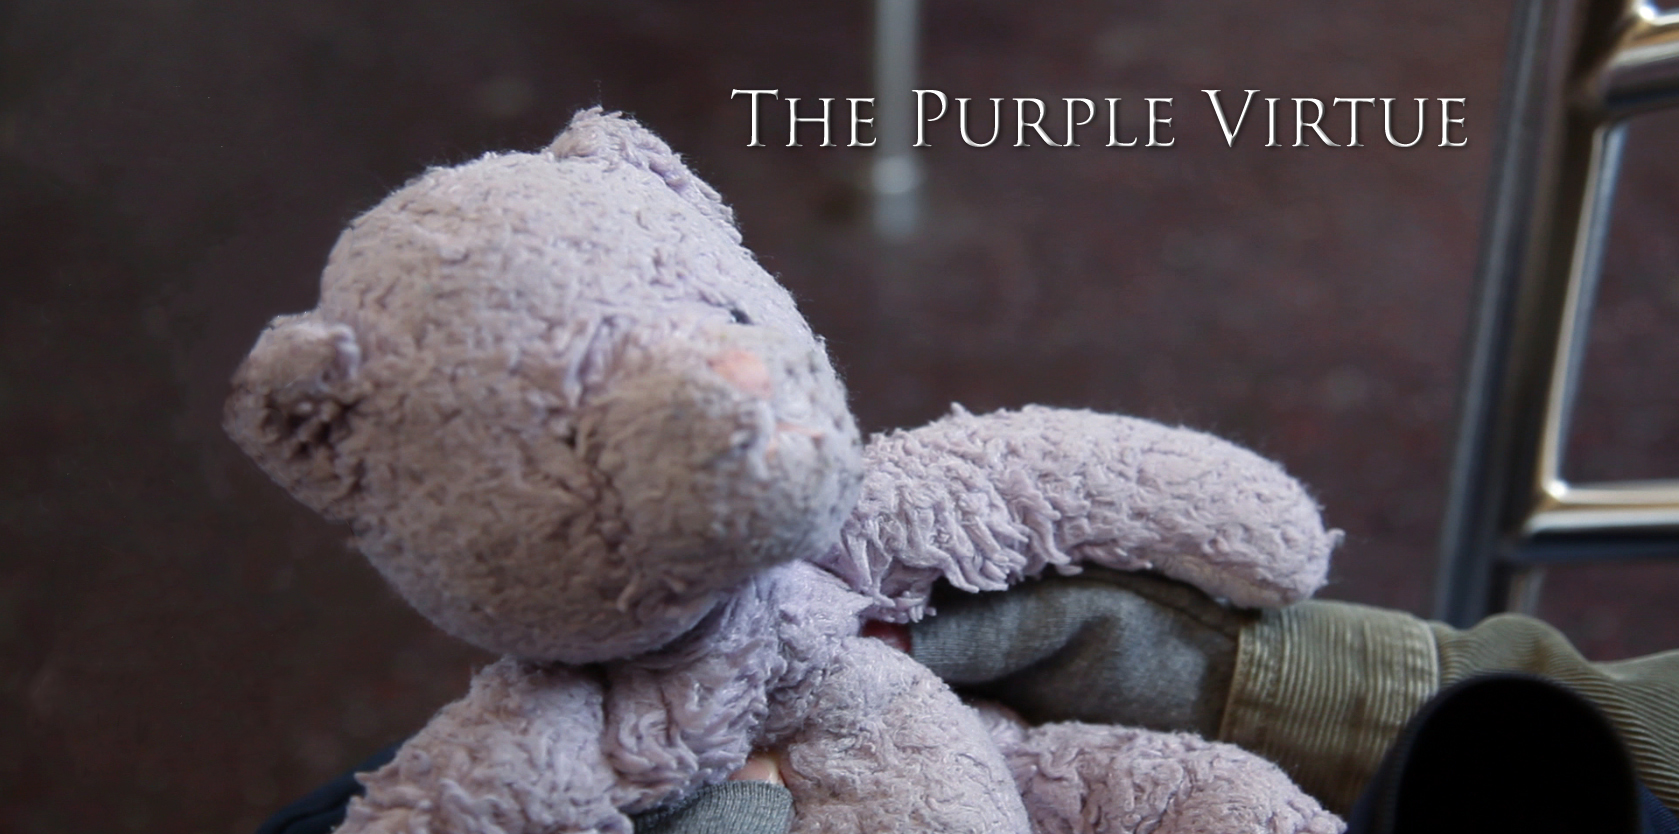 Purple Virtue Poster